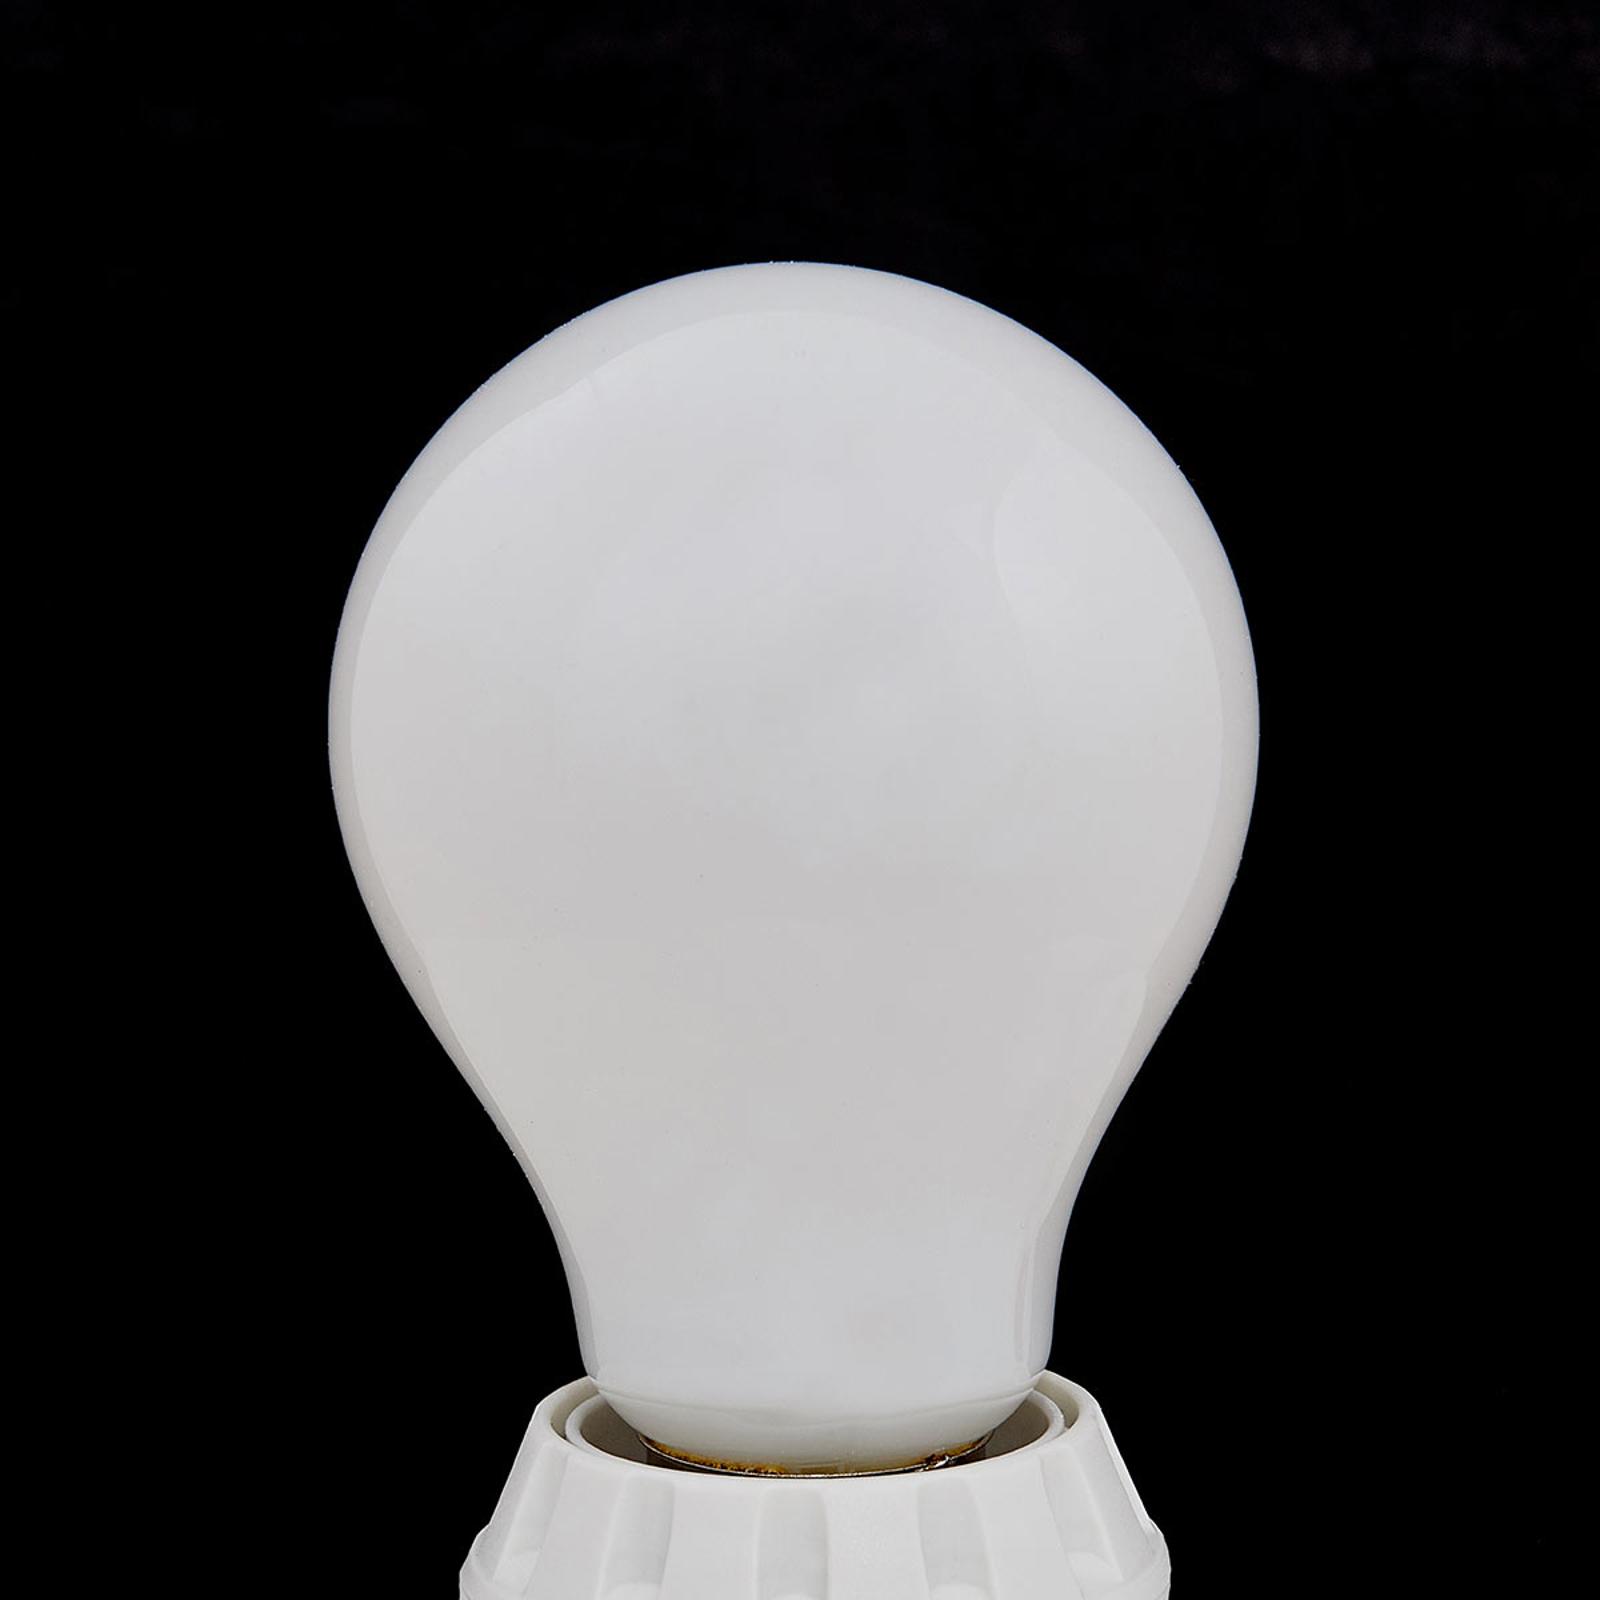 E27 LED lamp 8W, 1055 lm, 2.700K, opaal